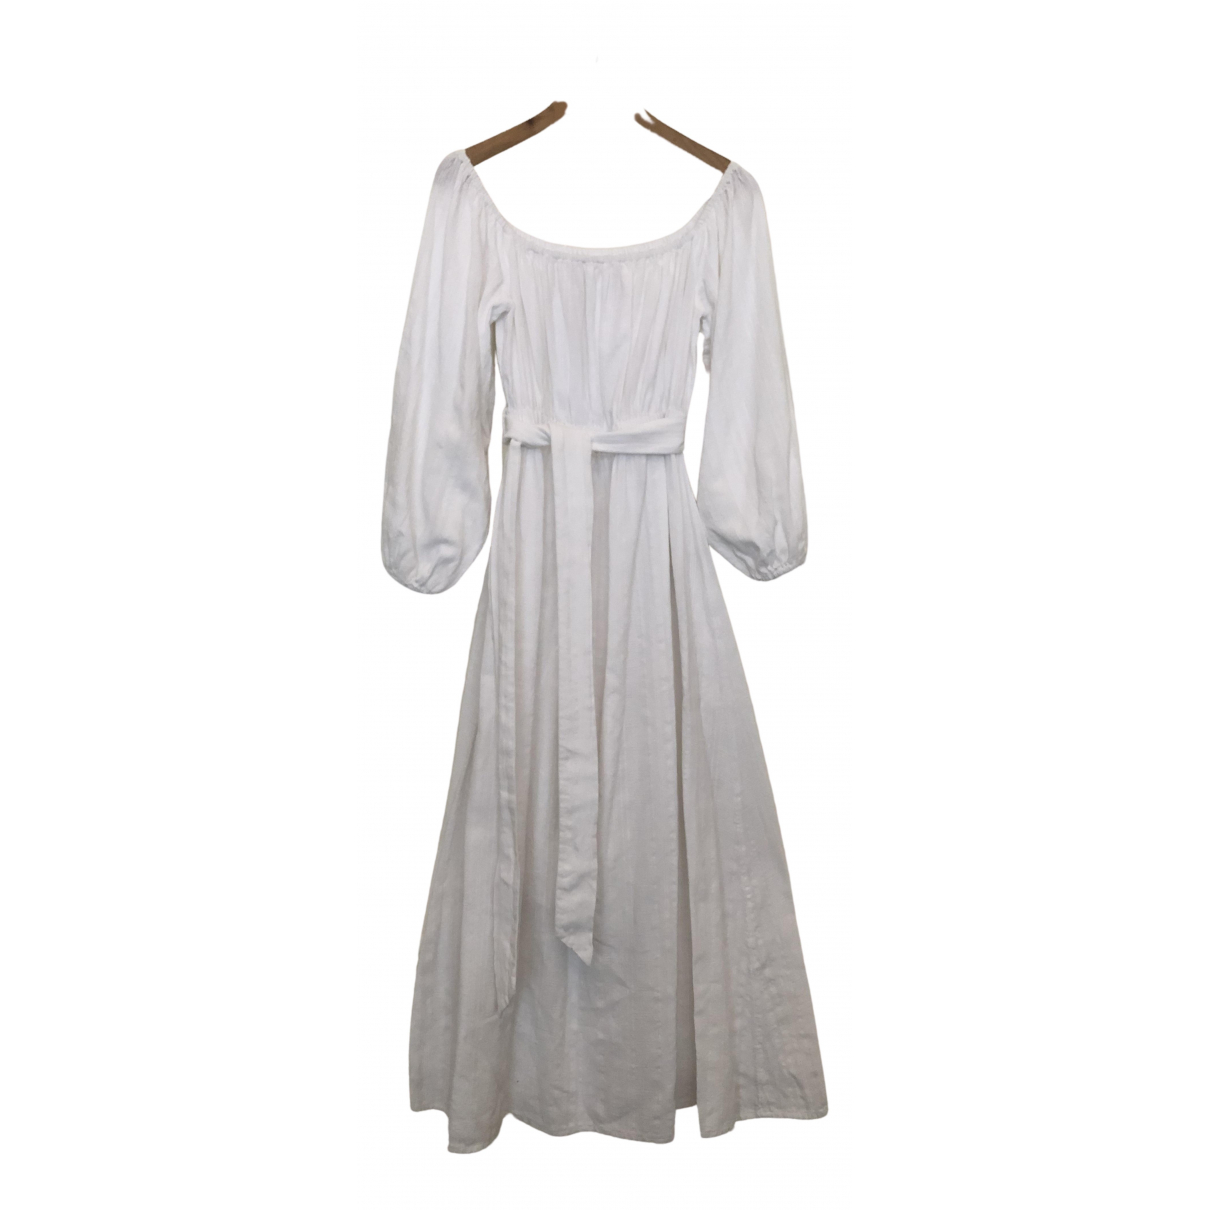 Mara Hoffman \N White Cotton dress for Women M International